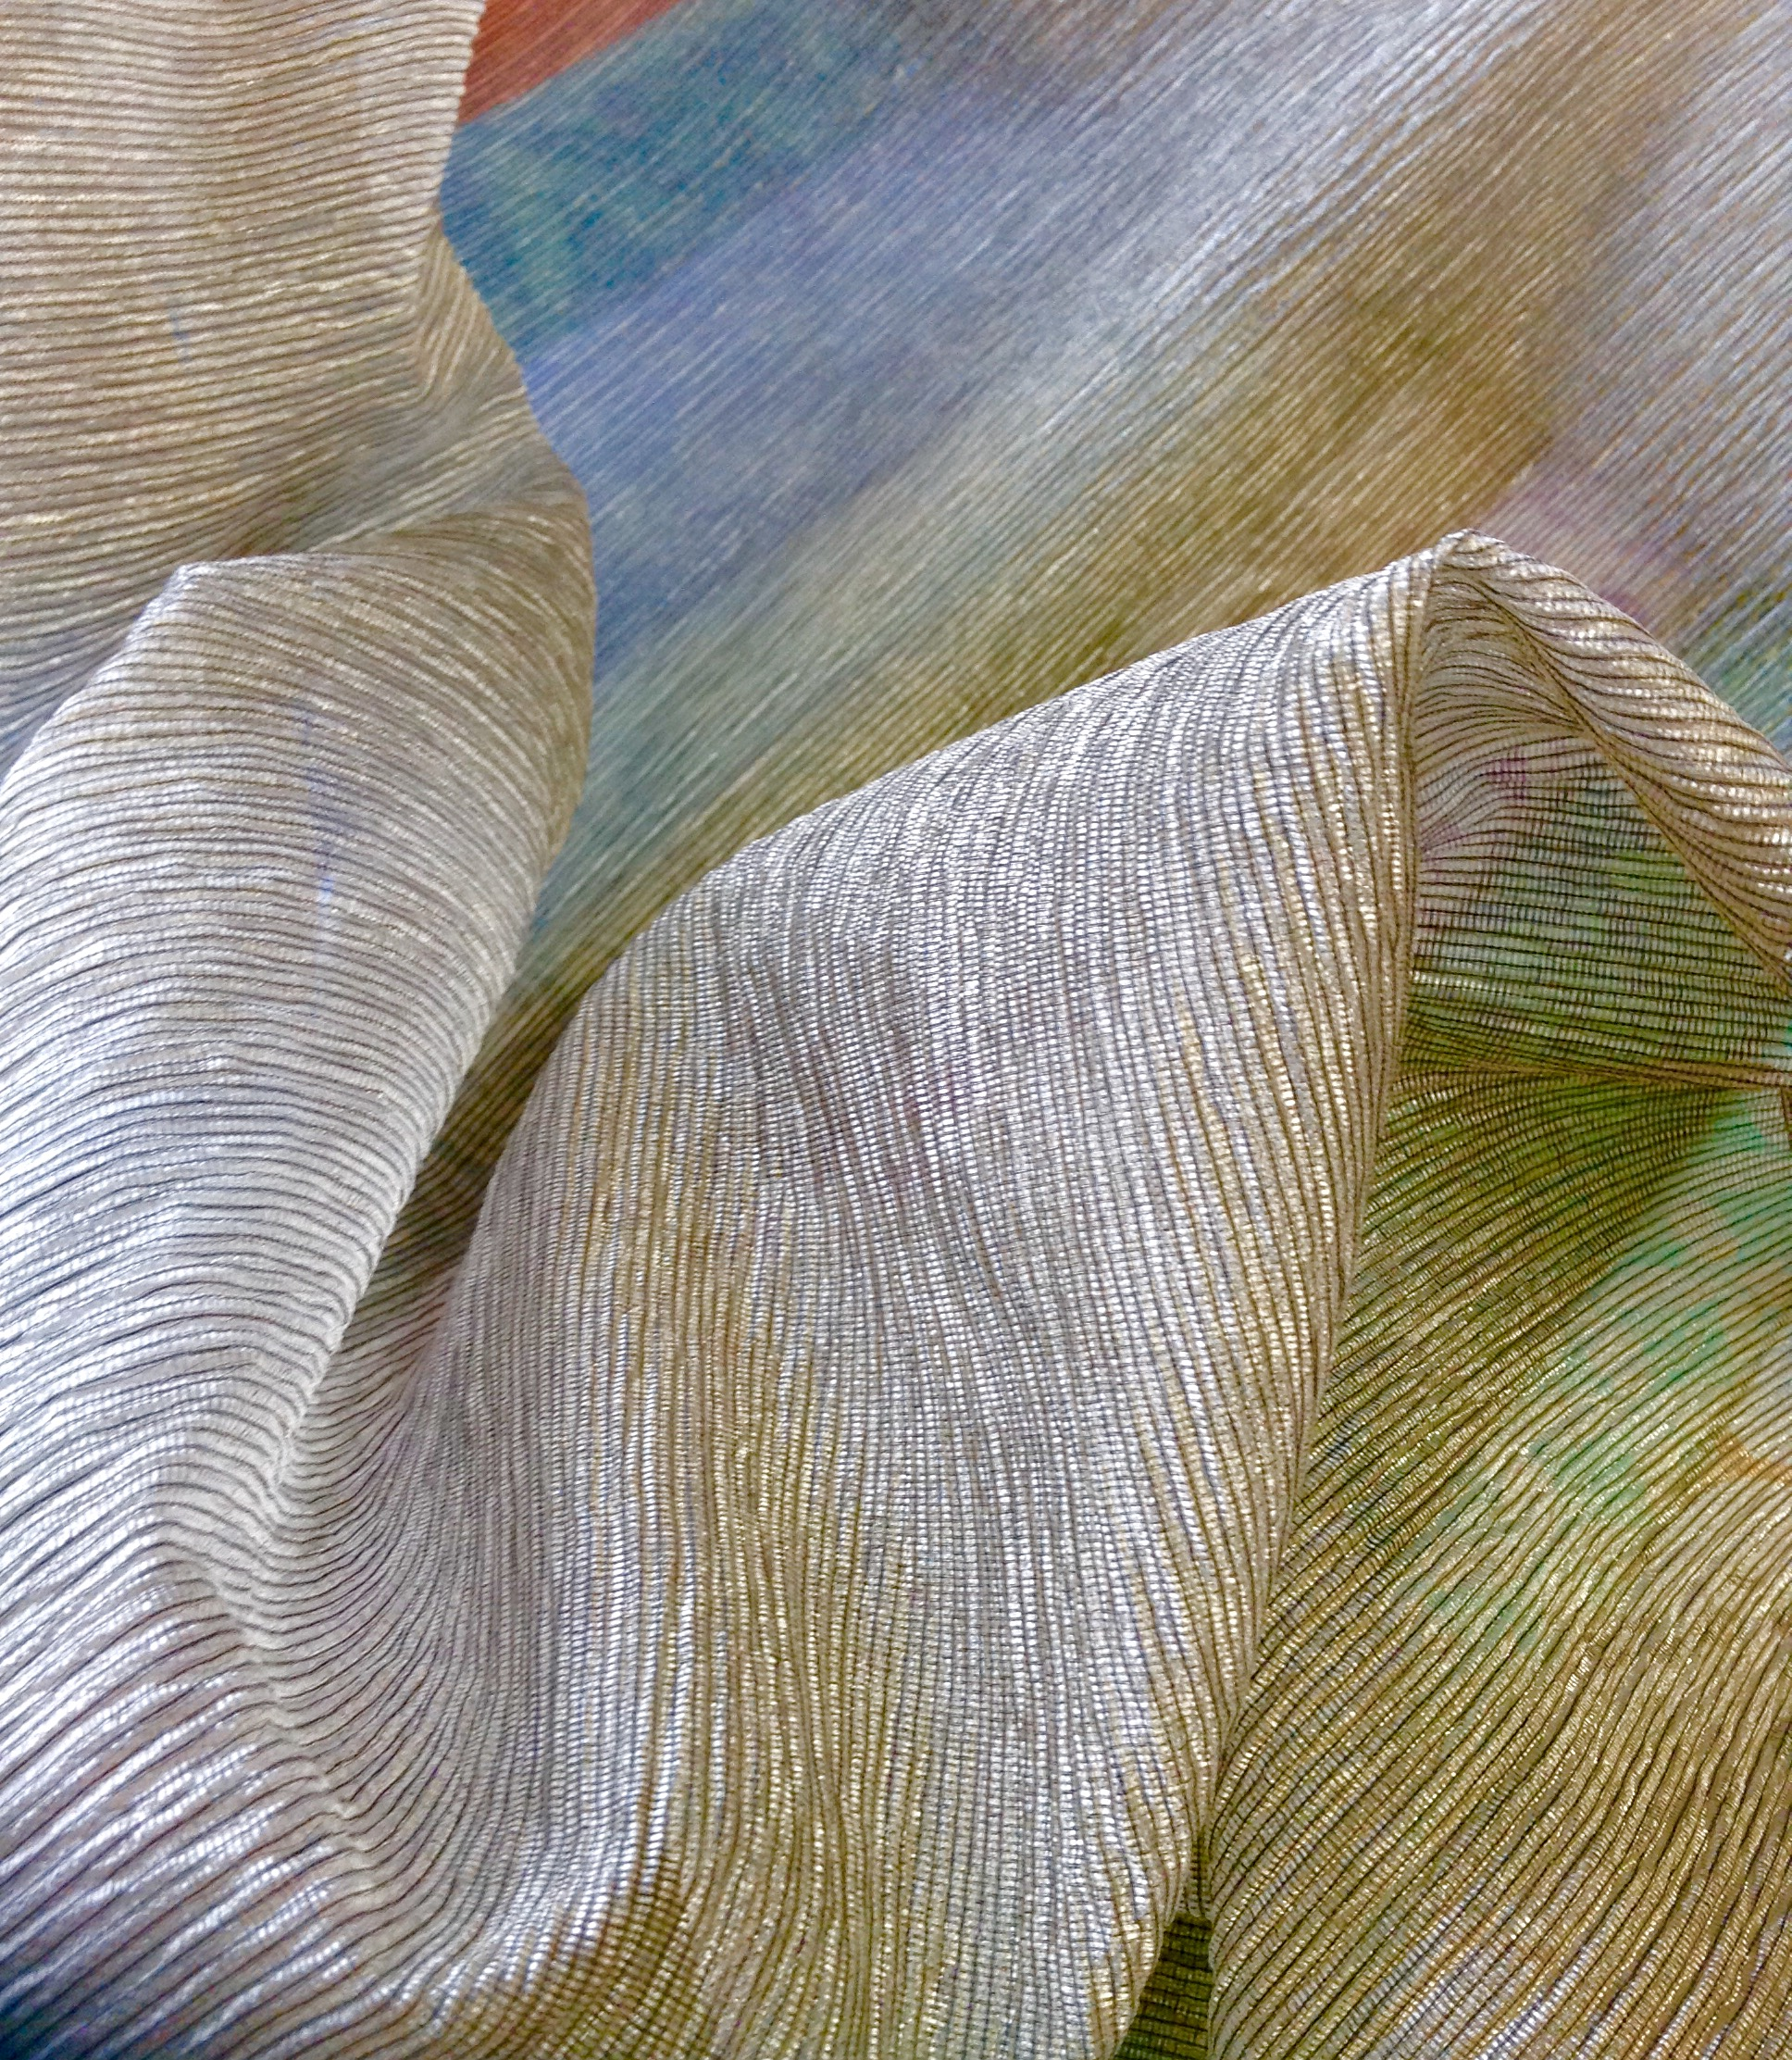 image5 (2).JPG